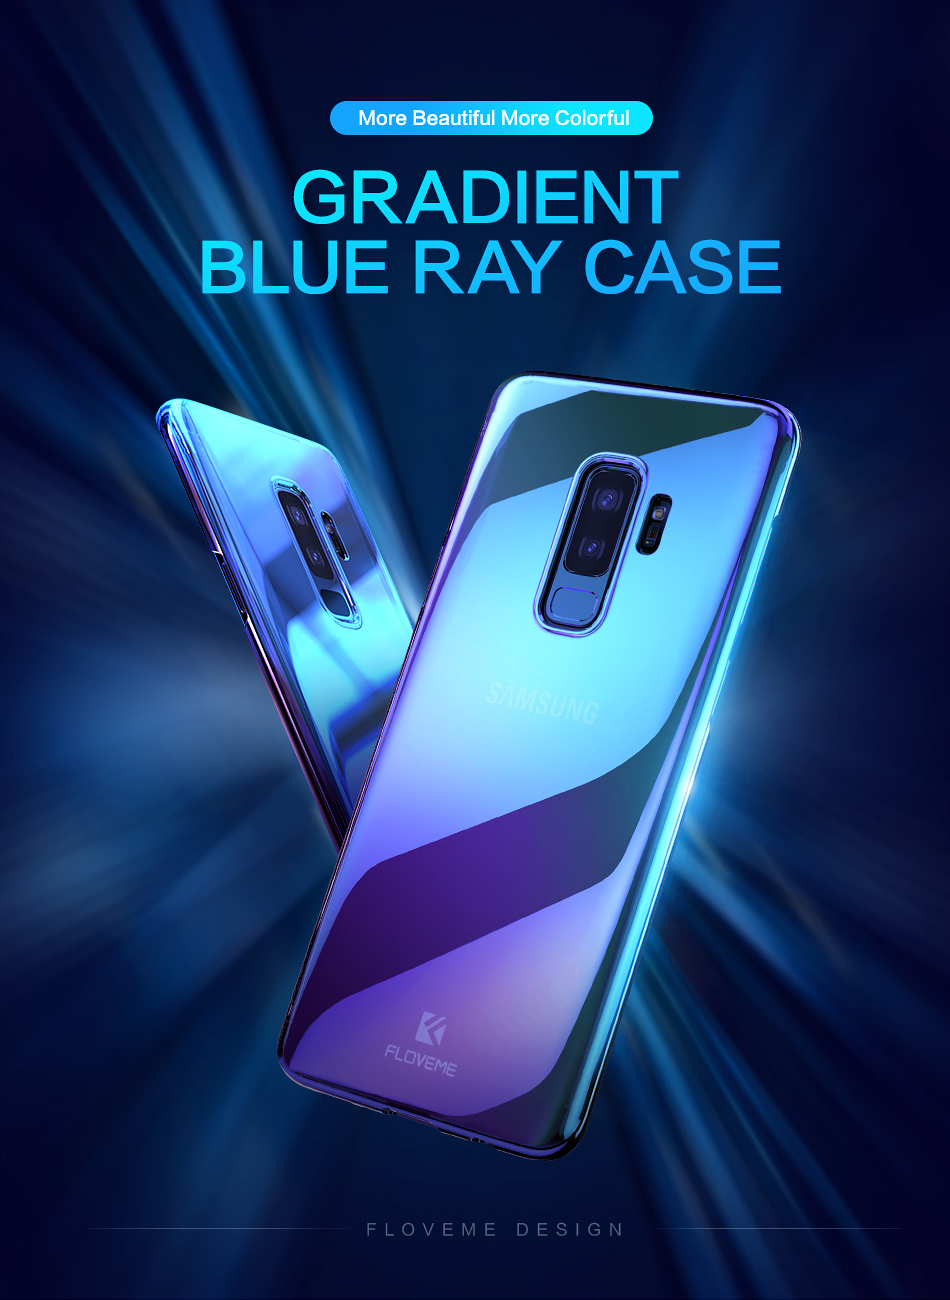 Samsung S8 S9 Plus Note 8 9 Case (1)